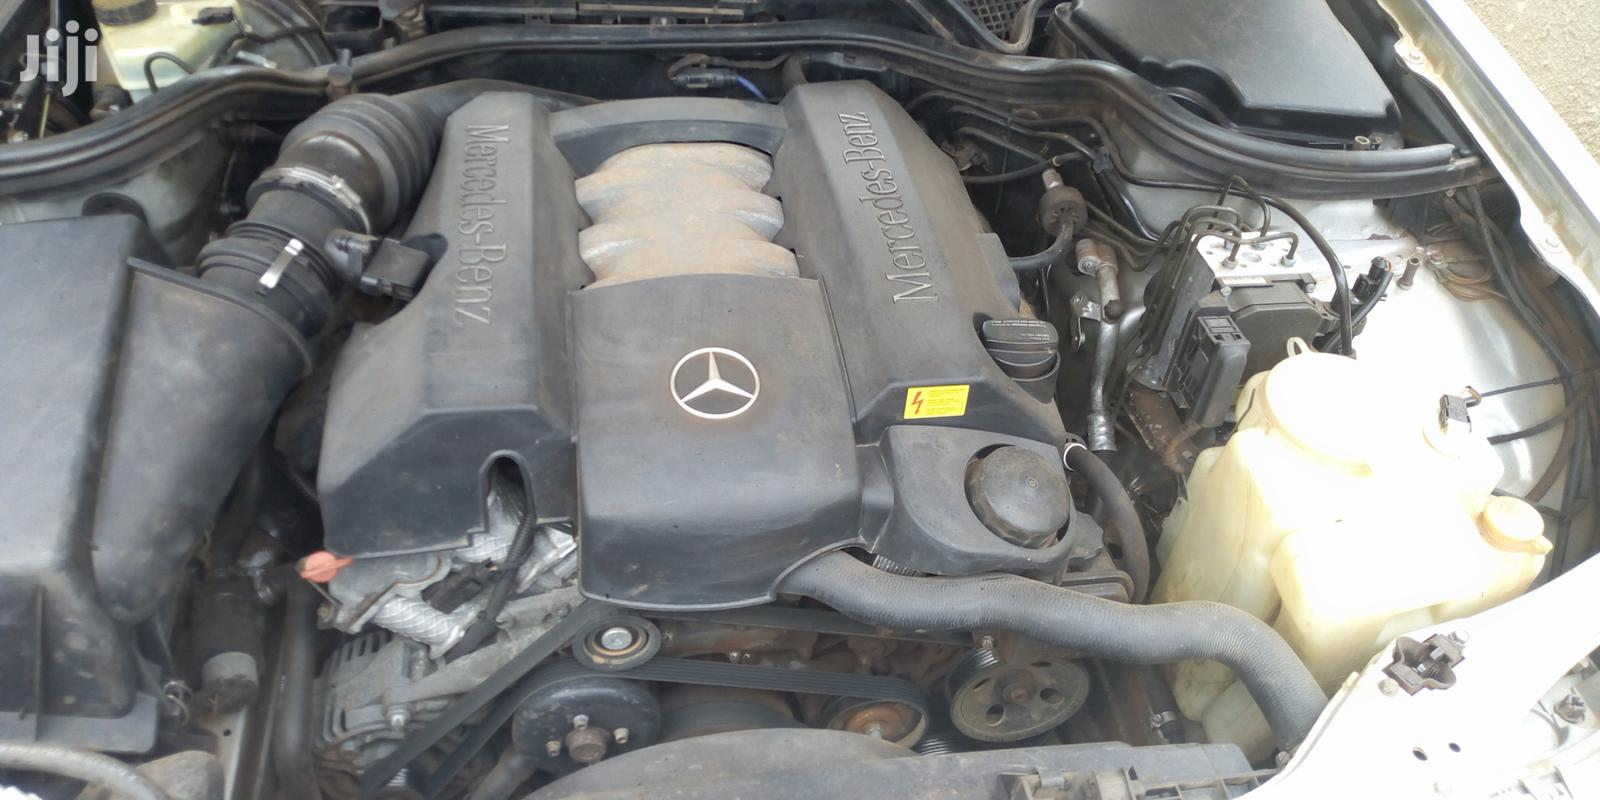 Archive: Mercedes-Benz E240 1998 Silver